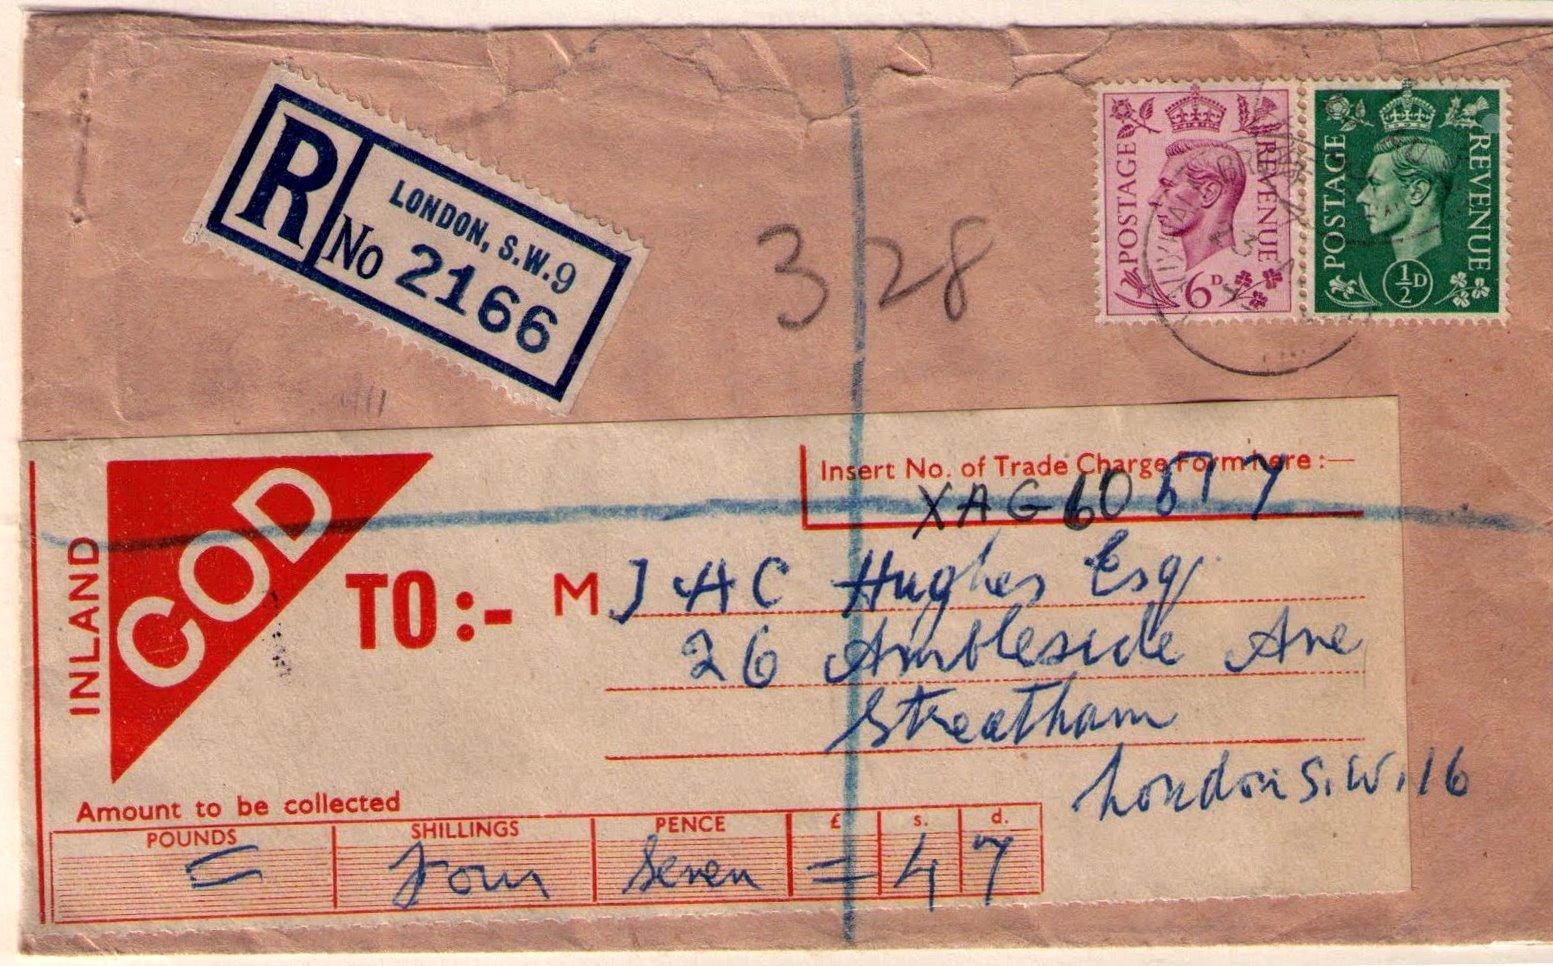 0342709e9d4 Cash on delivery - Wikipedia